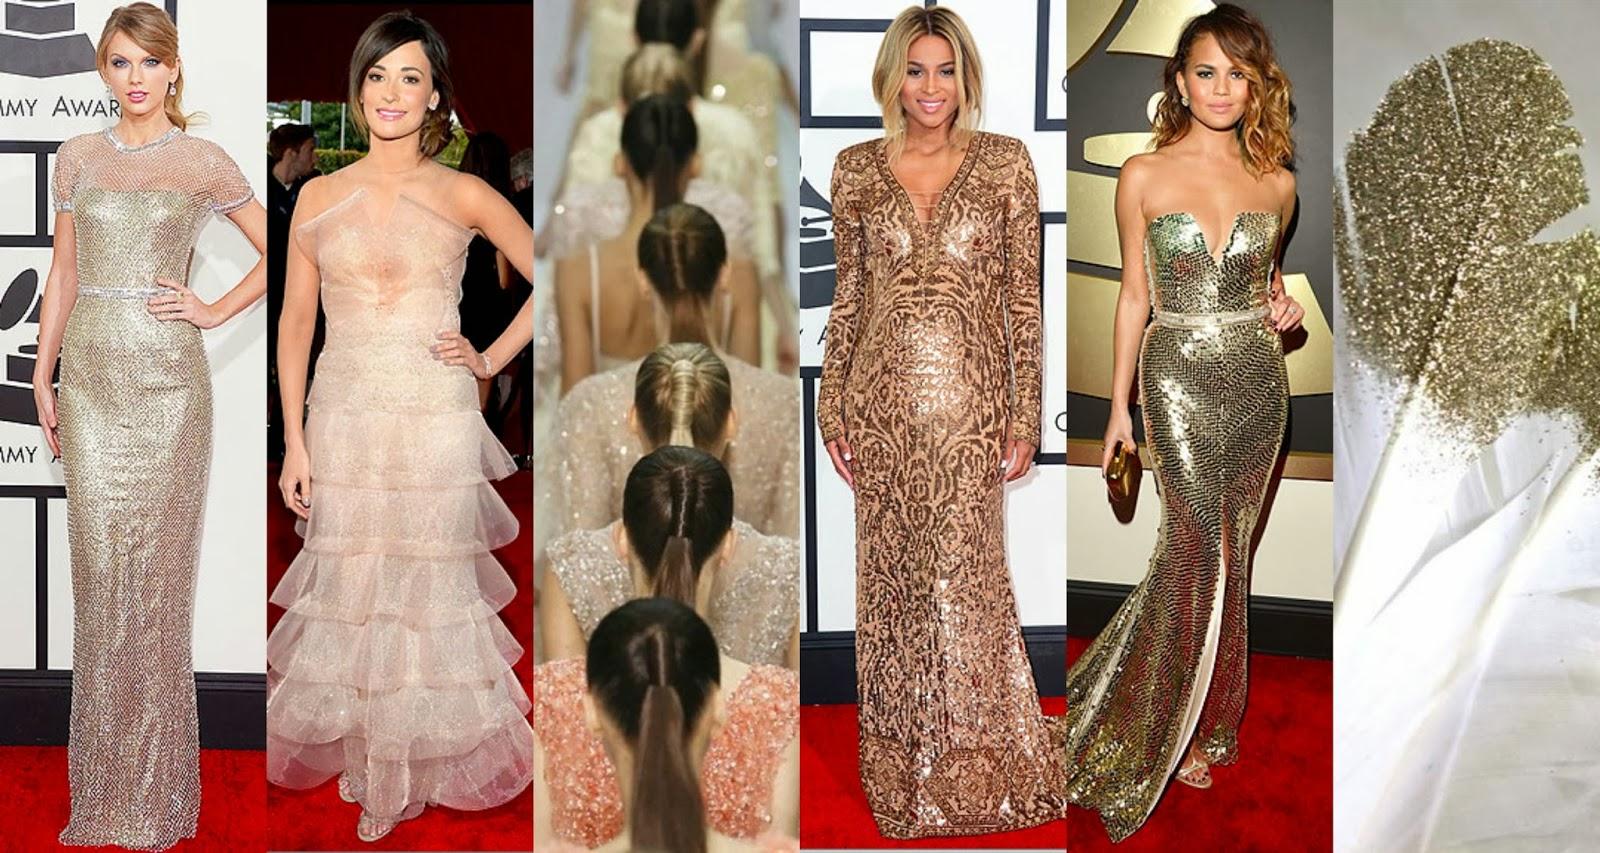 Grammys 2014 Metallics